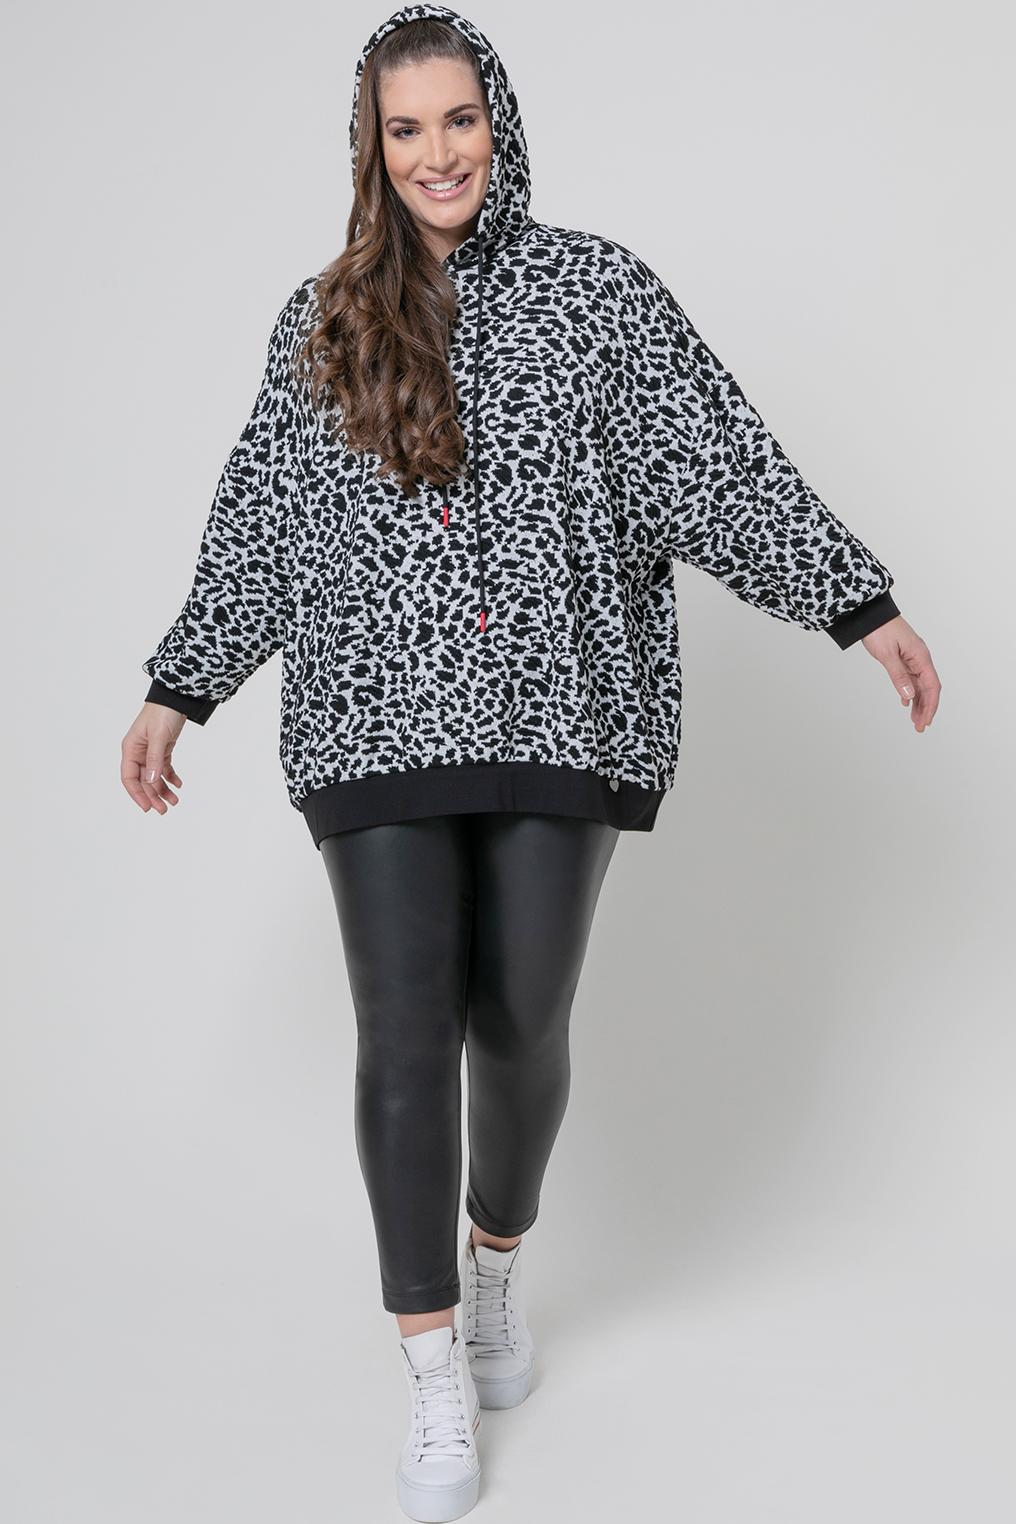 Mat fashion tuniek animal print